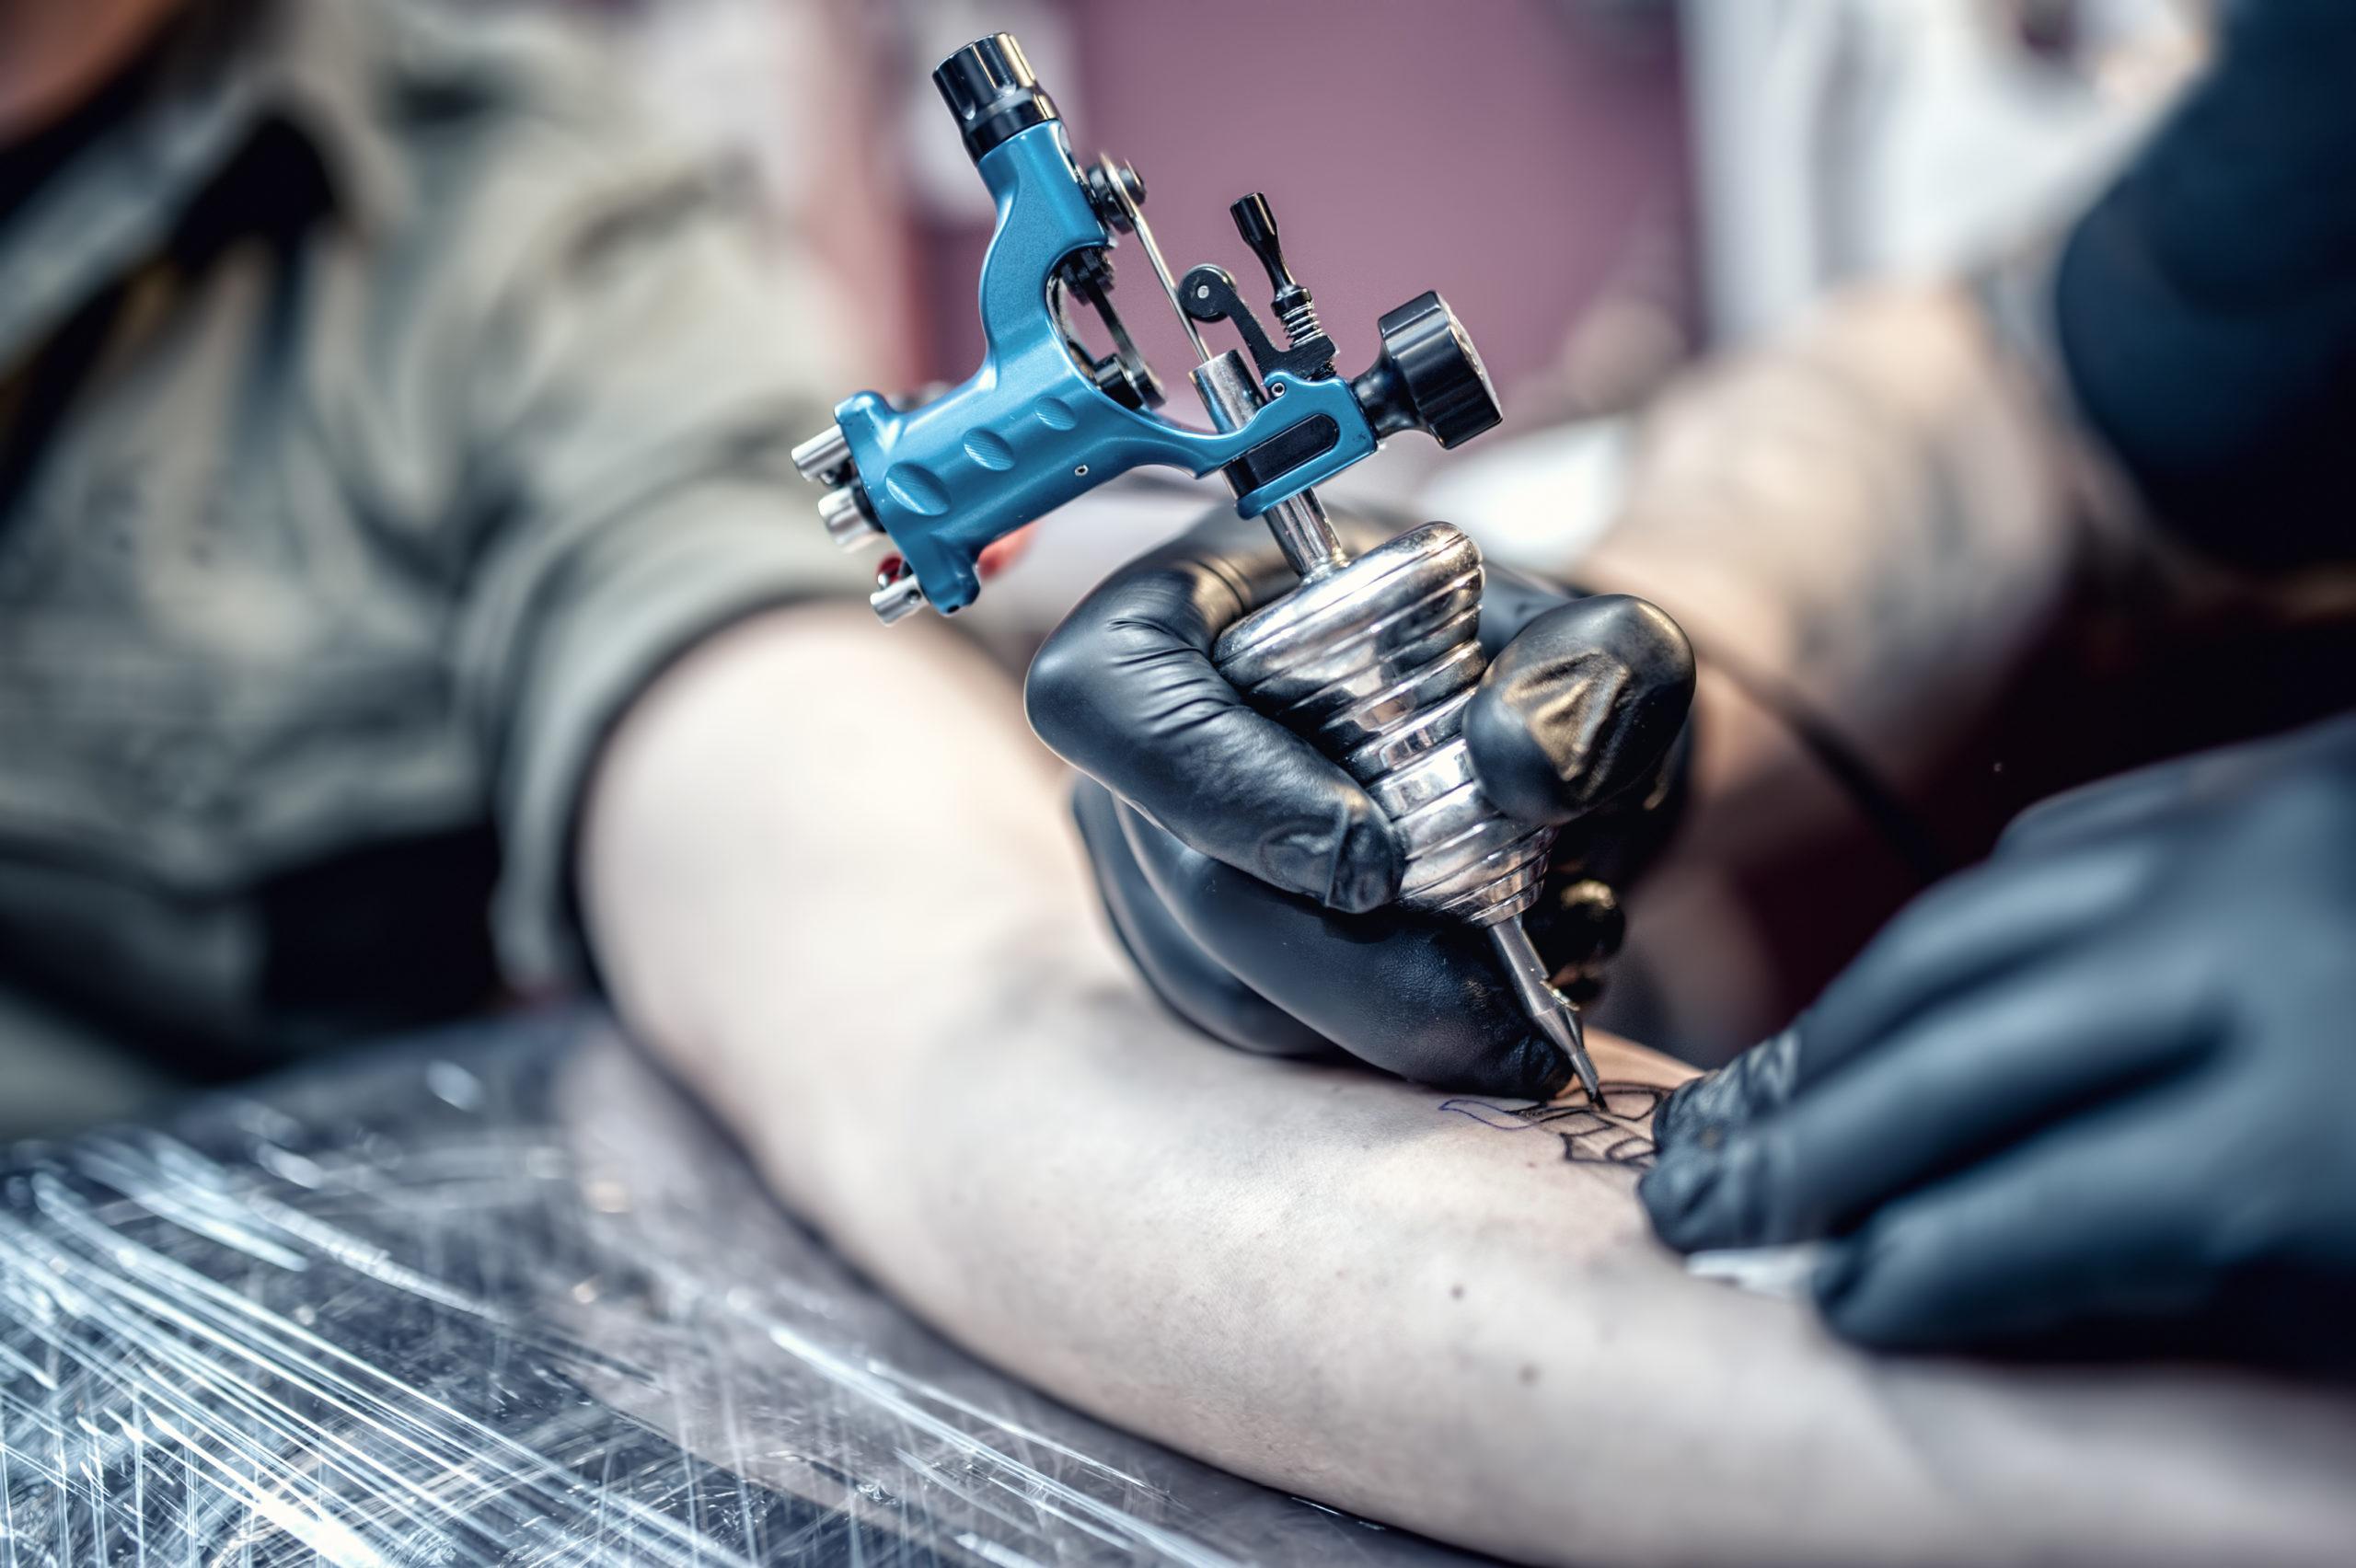 Tatuaje propiedad intelctual